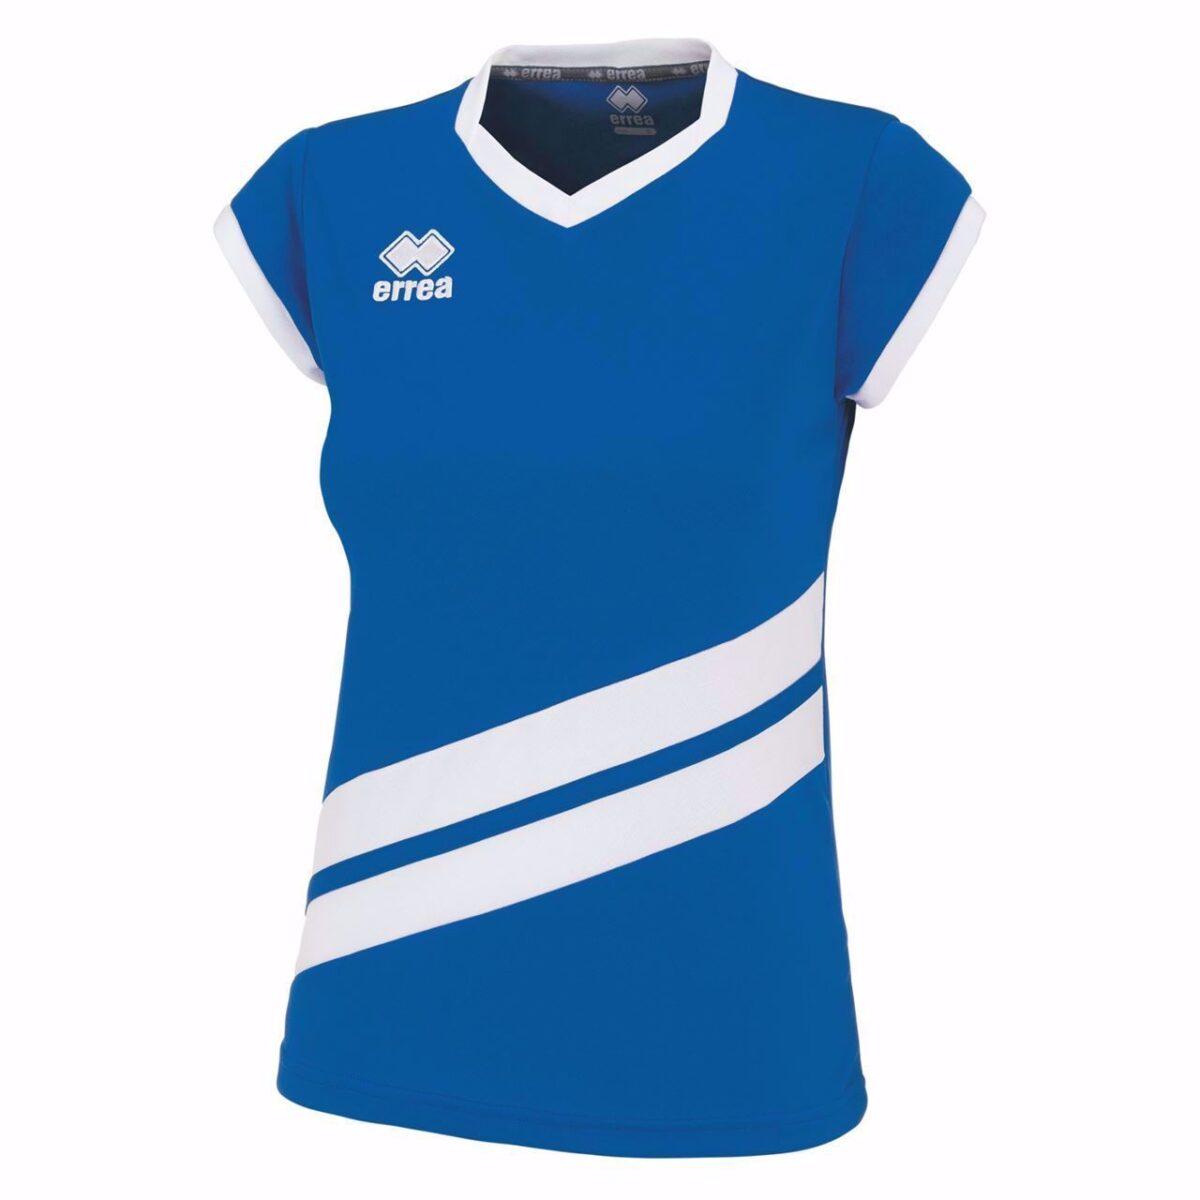 Errea Jens ADULT Short Sleeve shirt FM460C